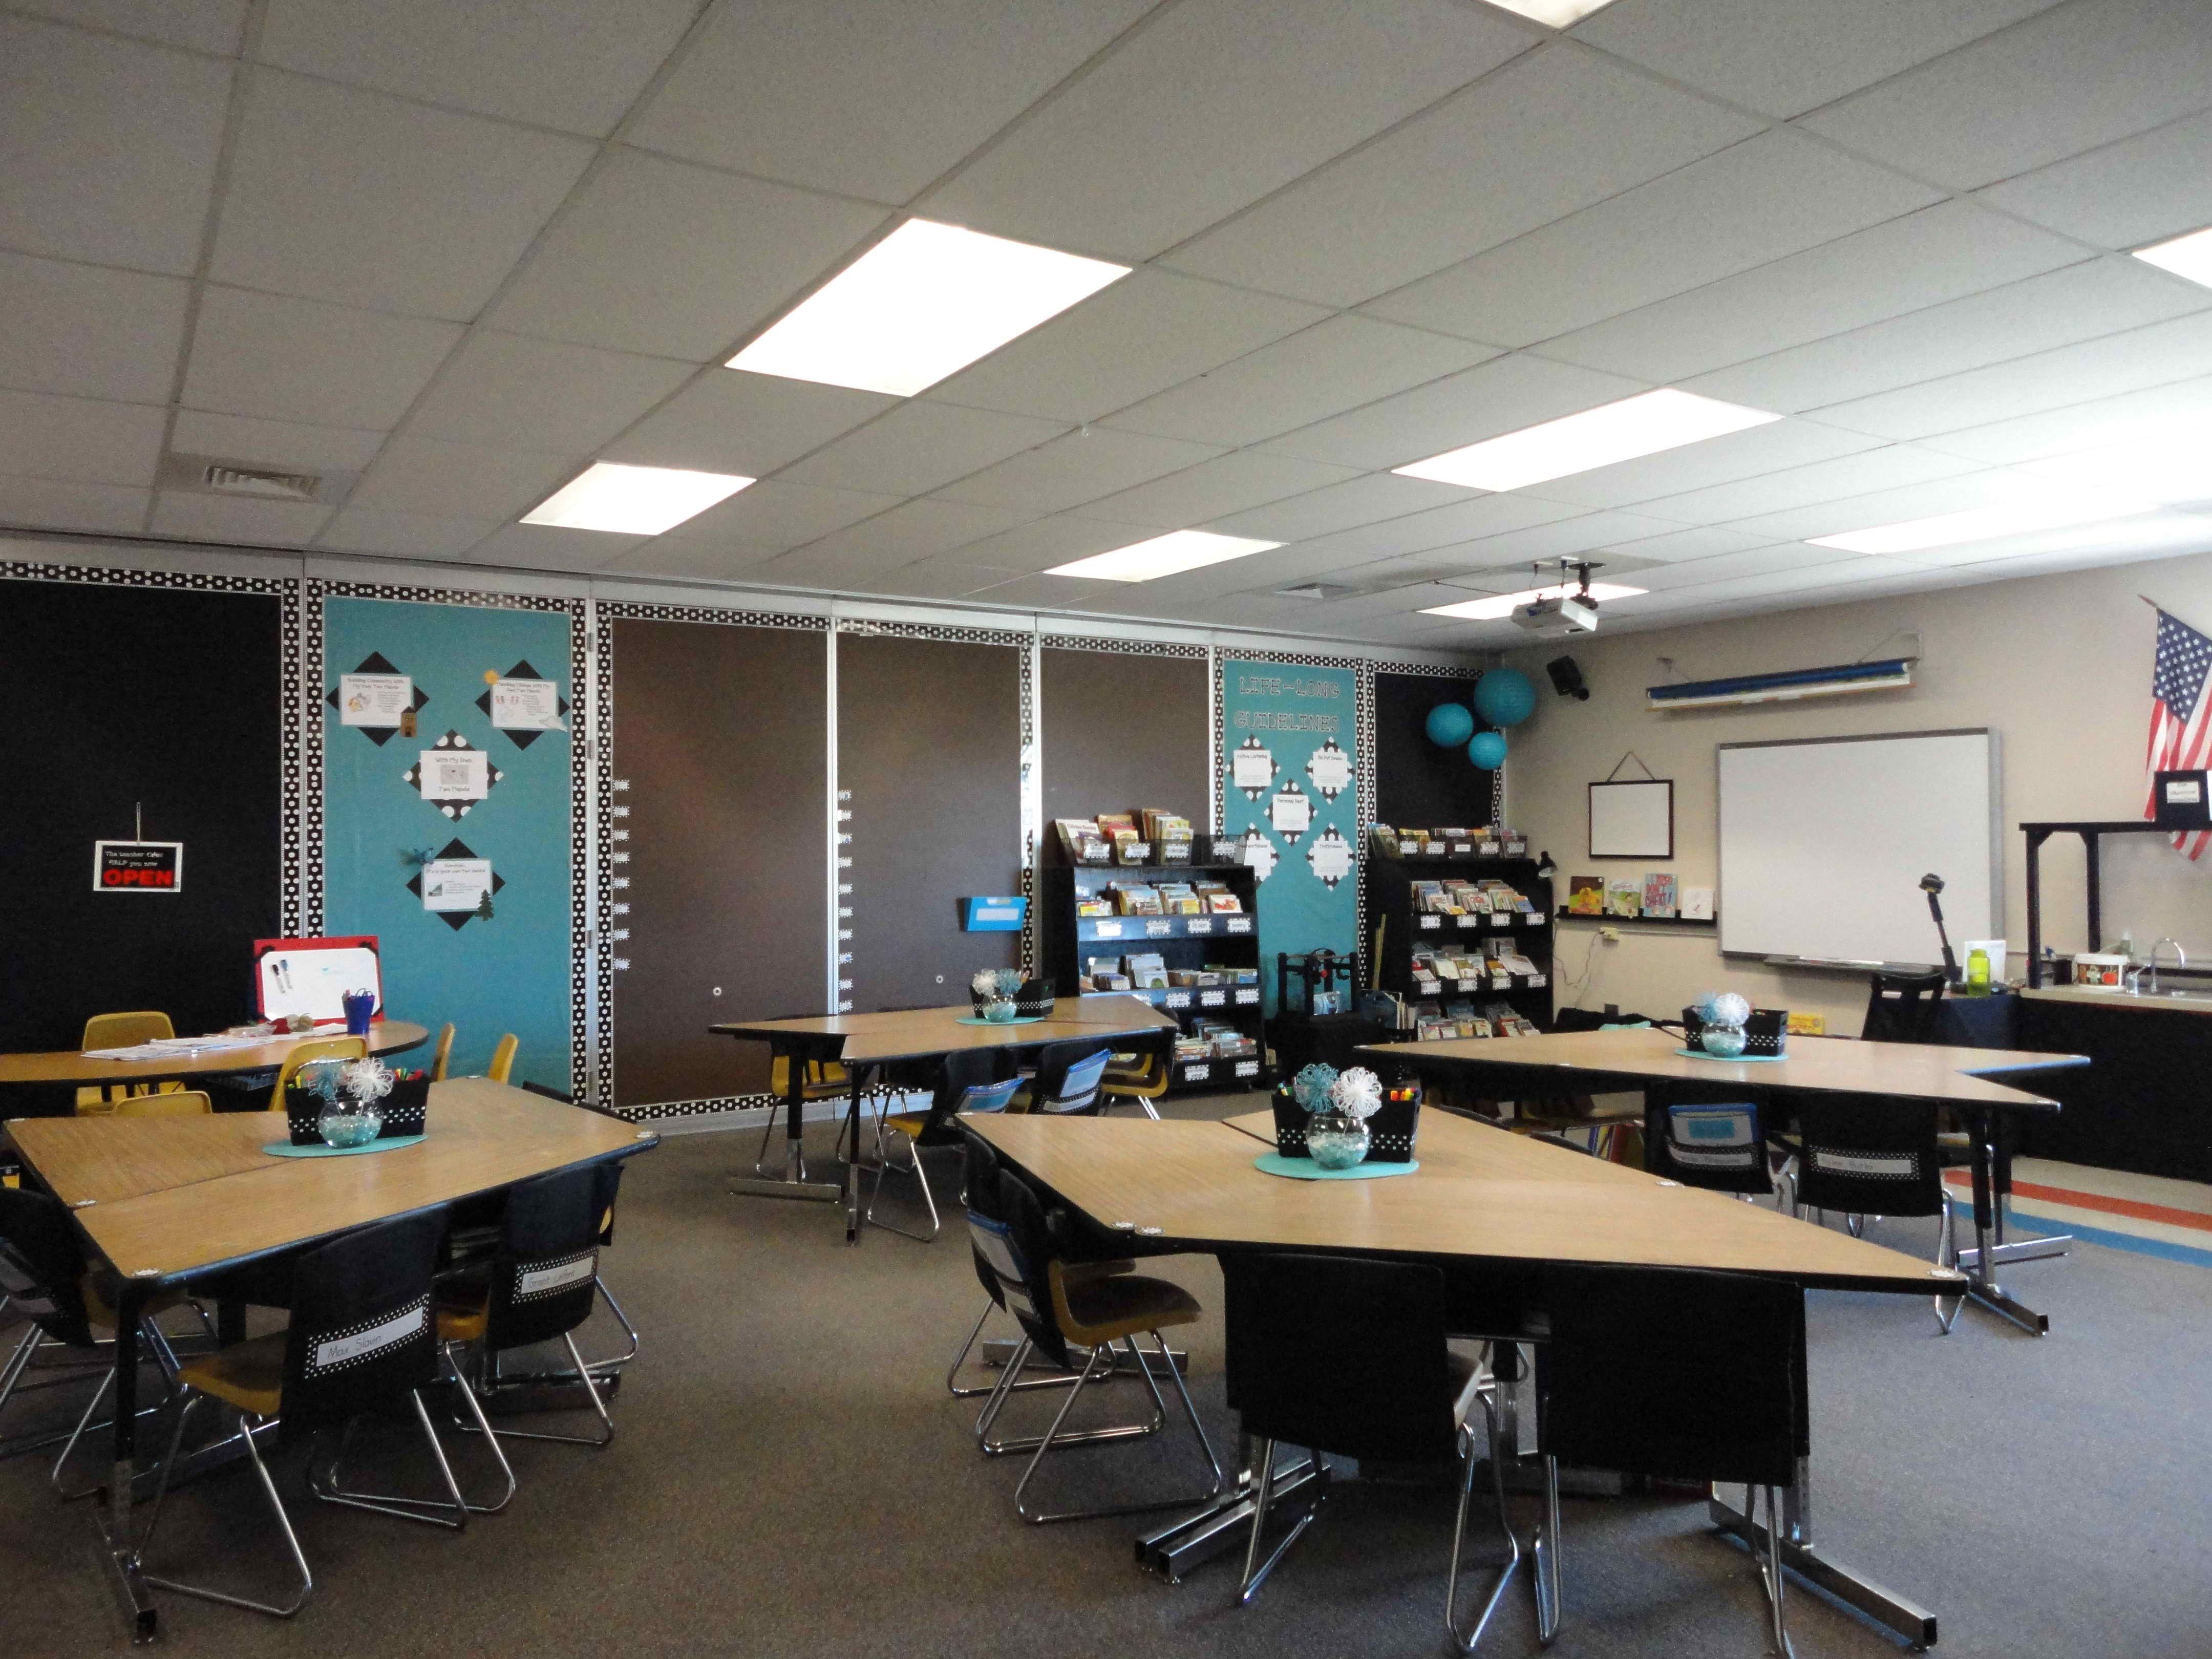 Classroom Design Paper : Wall of bulletin board paper classroom design pinterest